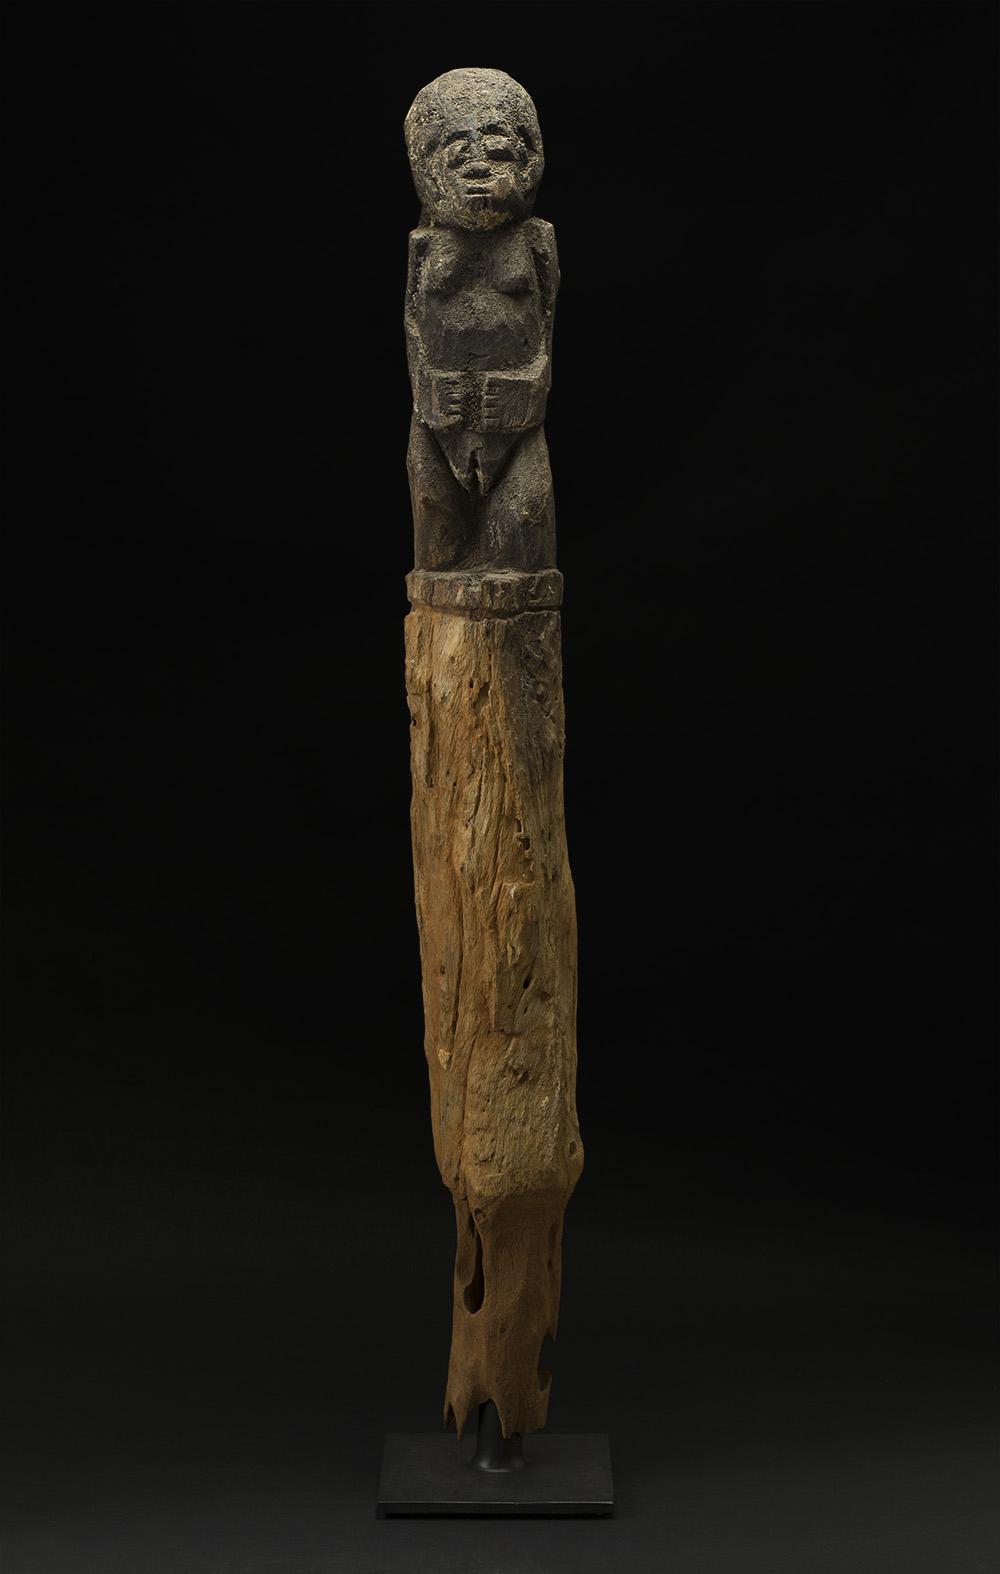 Africa    Bocio - Fon People - Benin  , Early 20th C. Wood, sacrificial materials 48 x 5.5 x 5 inches 121.9 x 14 x 12.7 cm Af 333